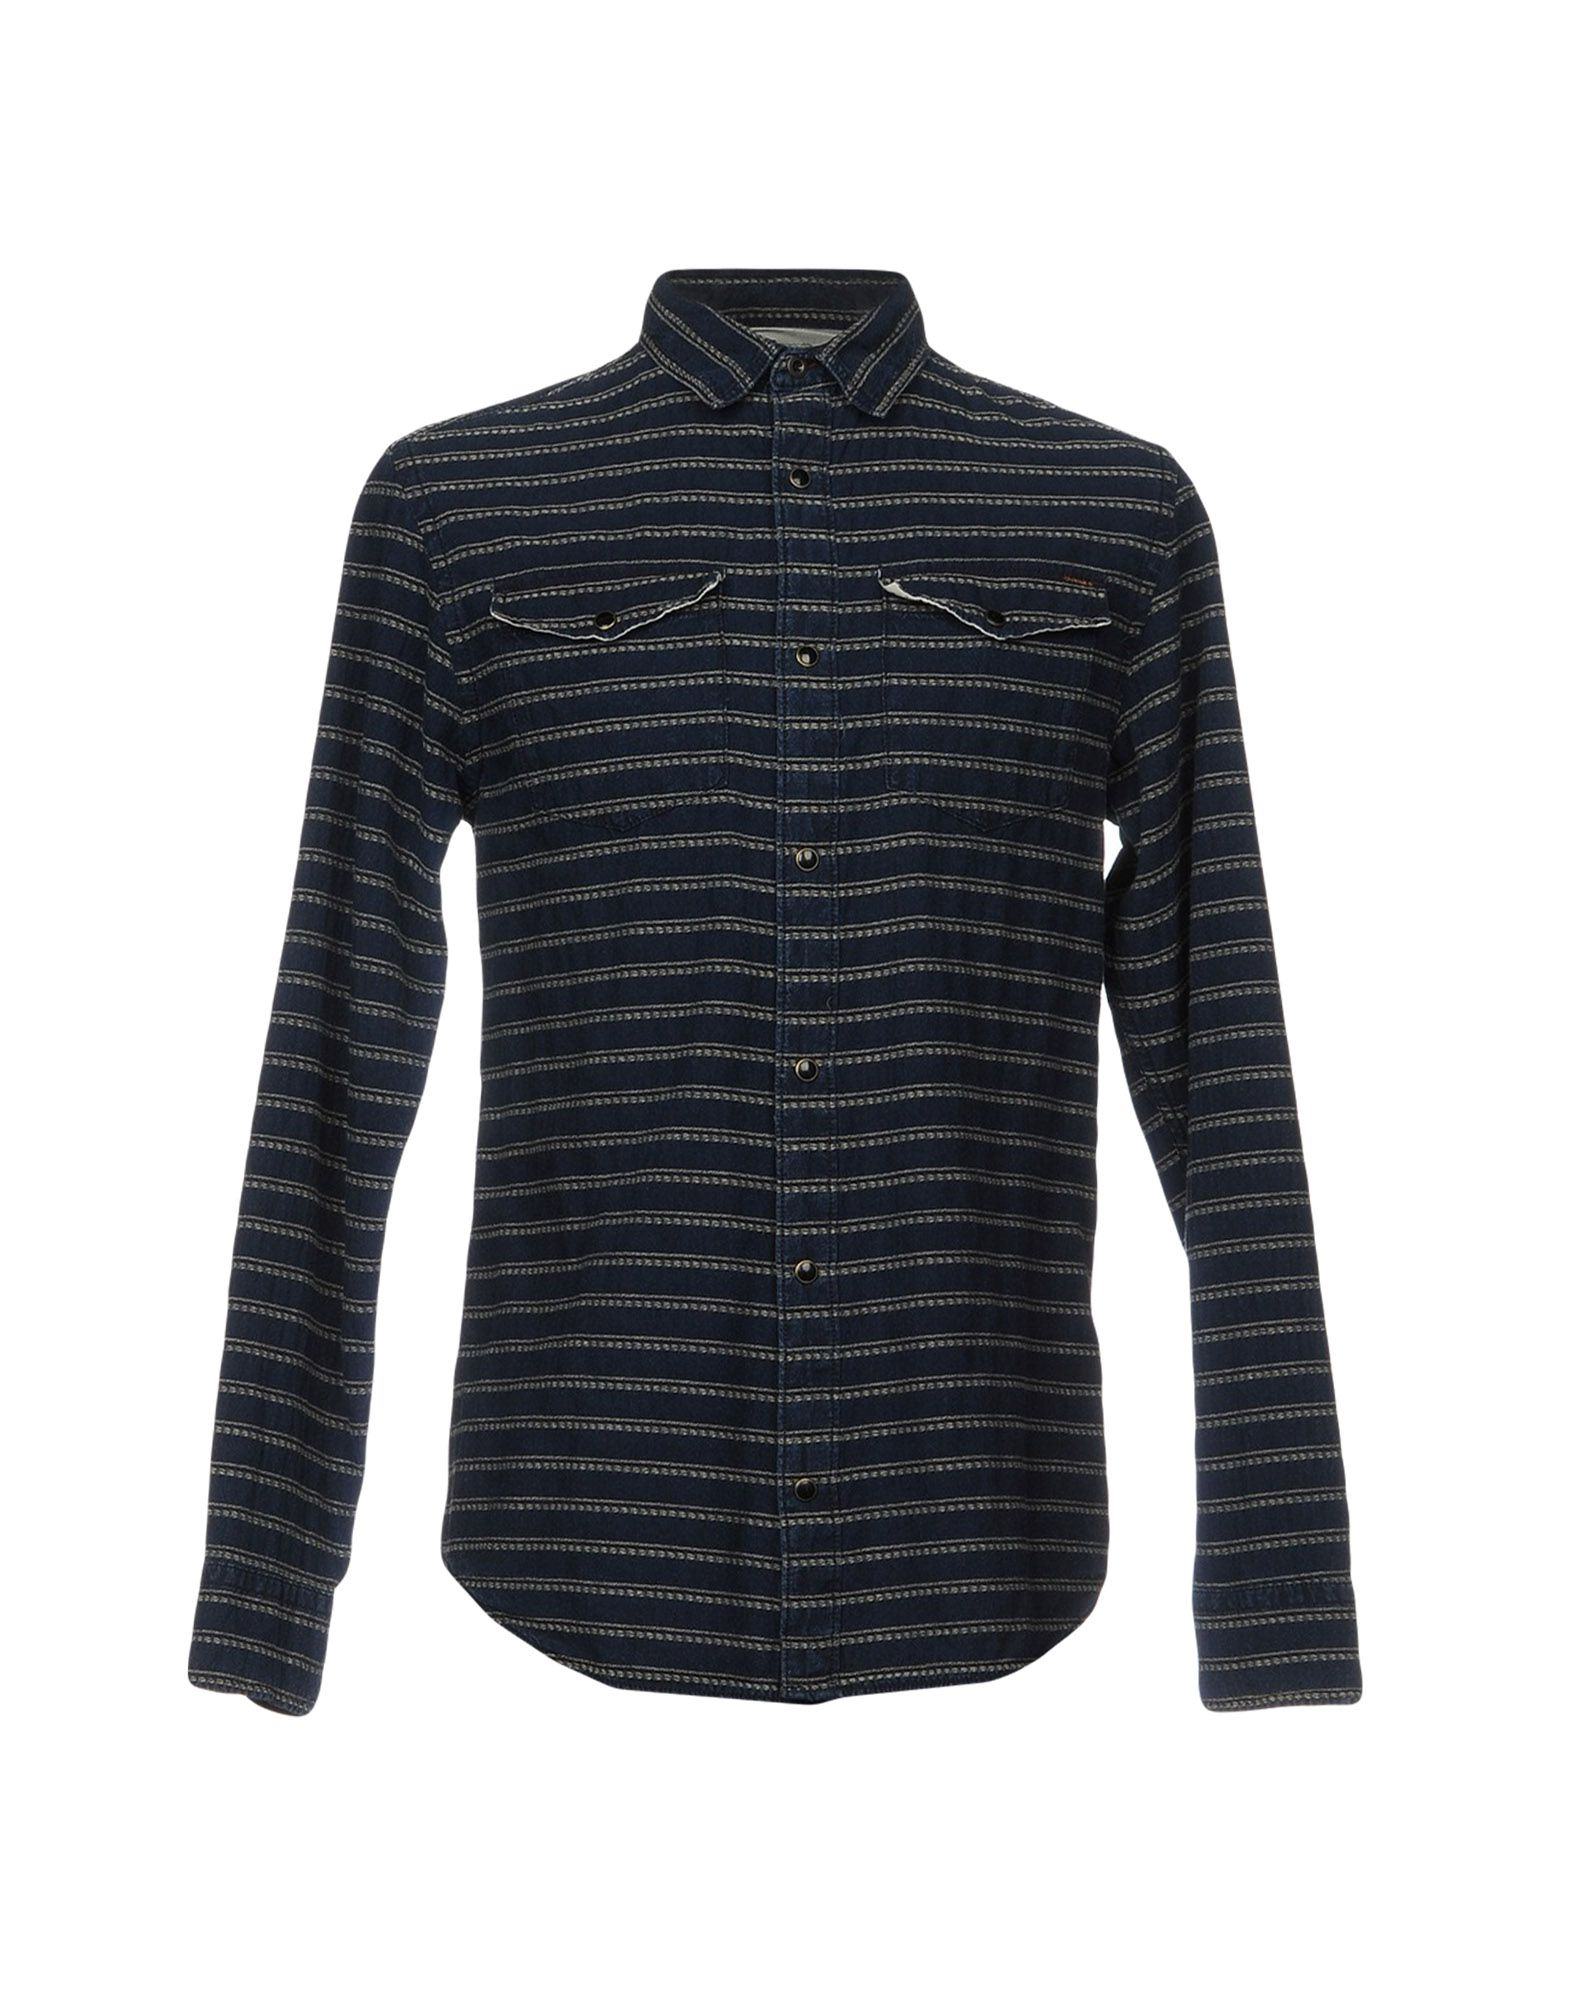 JACK & JONES Джинсовая рубашка рубашка джинсовая jack